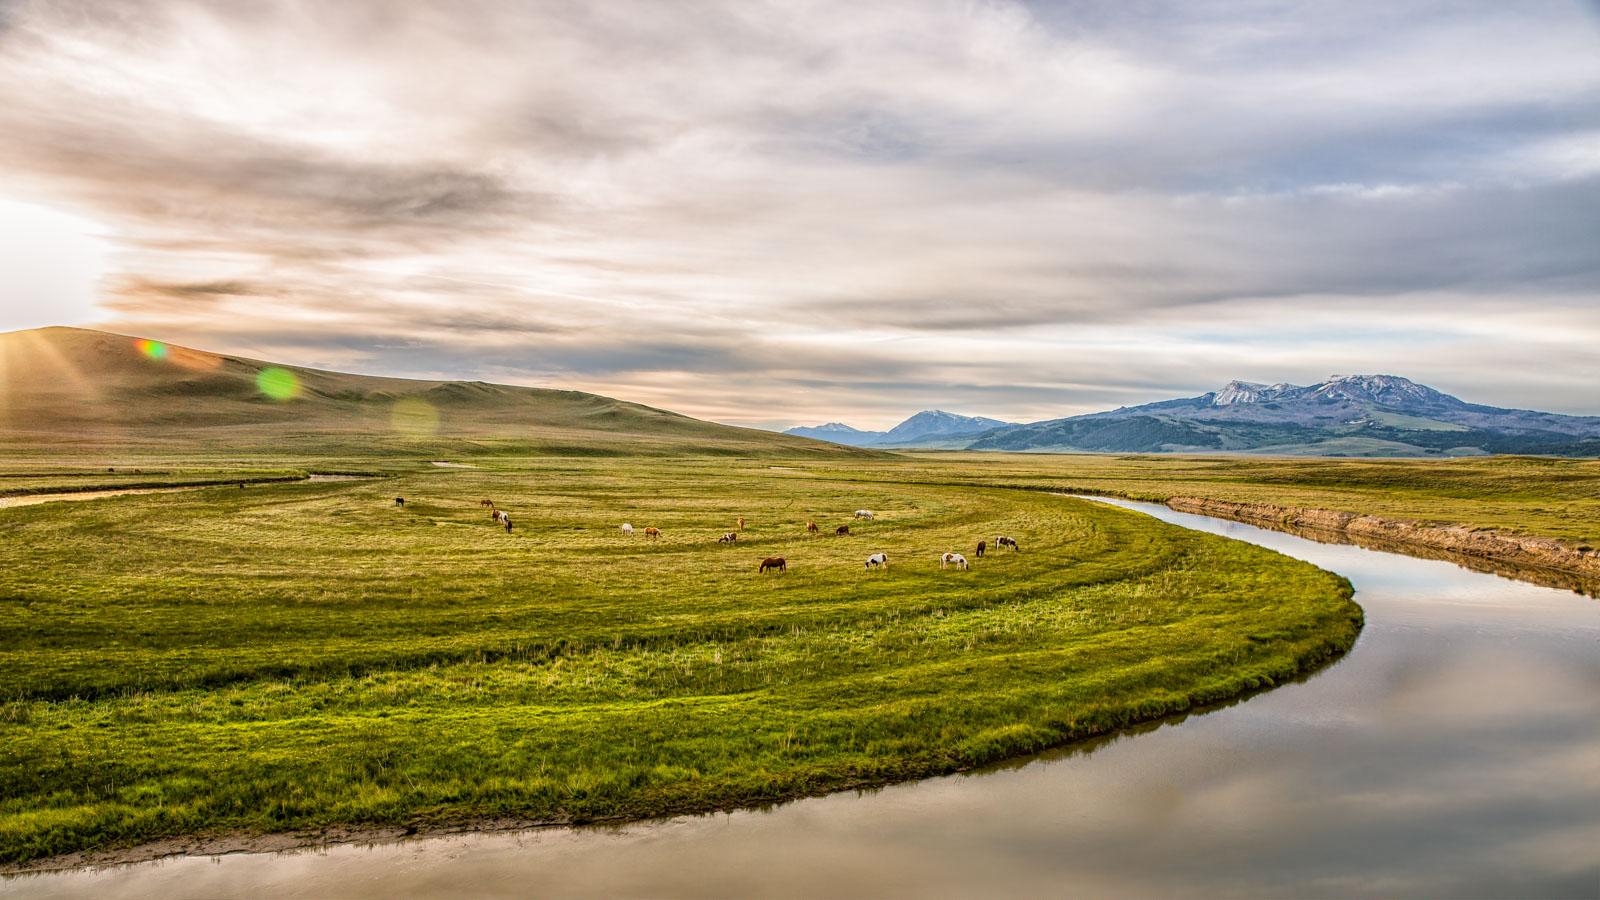 adventure photographer, j bar l ranch, montana - overview photo